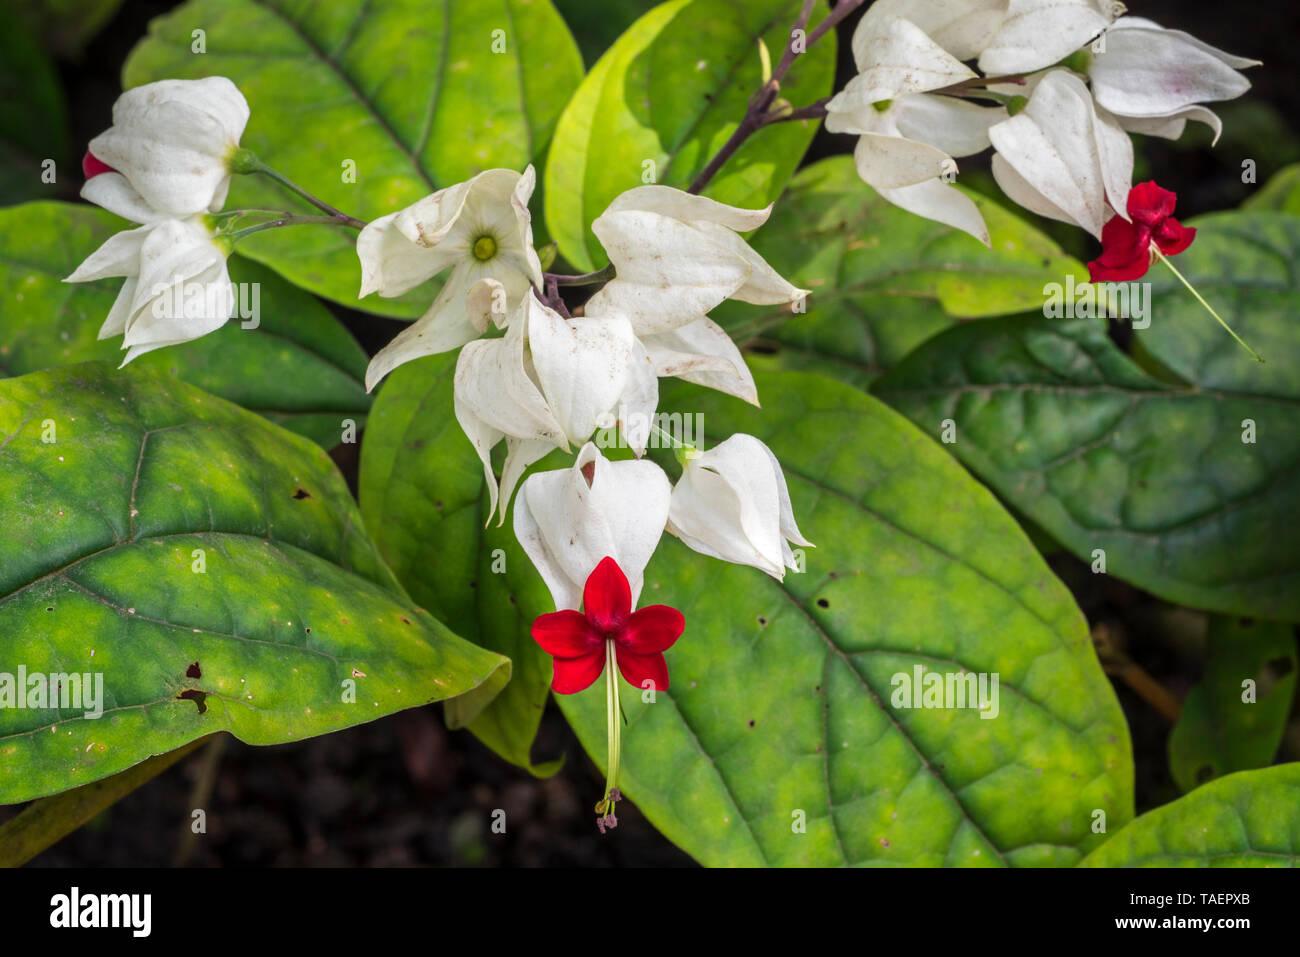 Bleeding glory-bower / bagflower / bleeding-heart vine (Clerodendrum thomsoniae) in flower, evergreen liana native to tropical West Africa - Stock Image